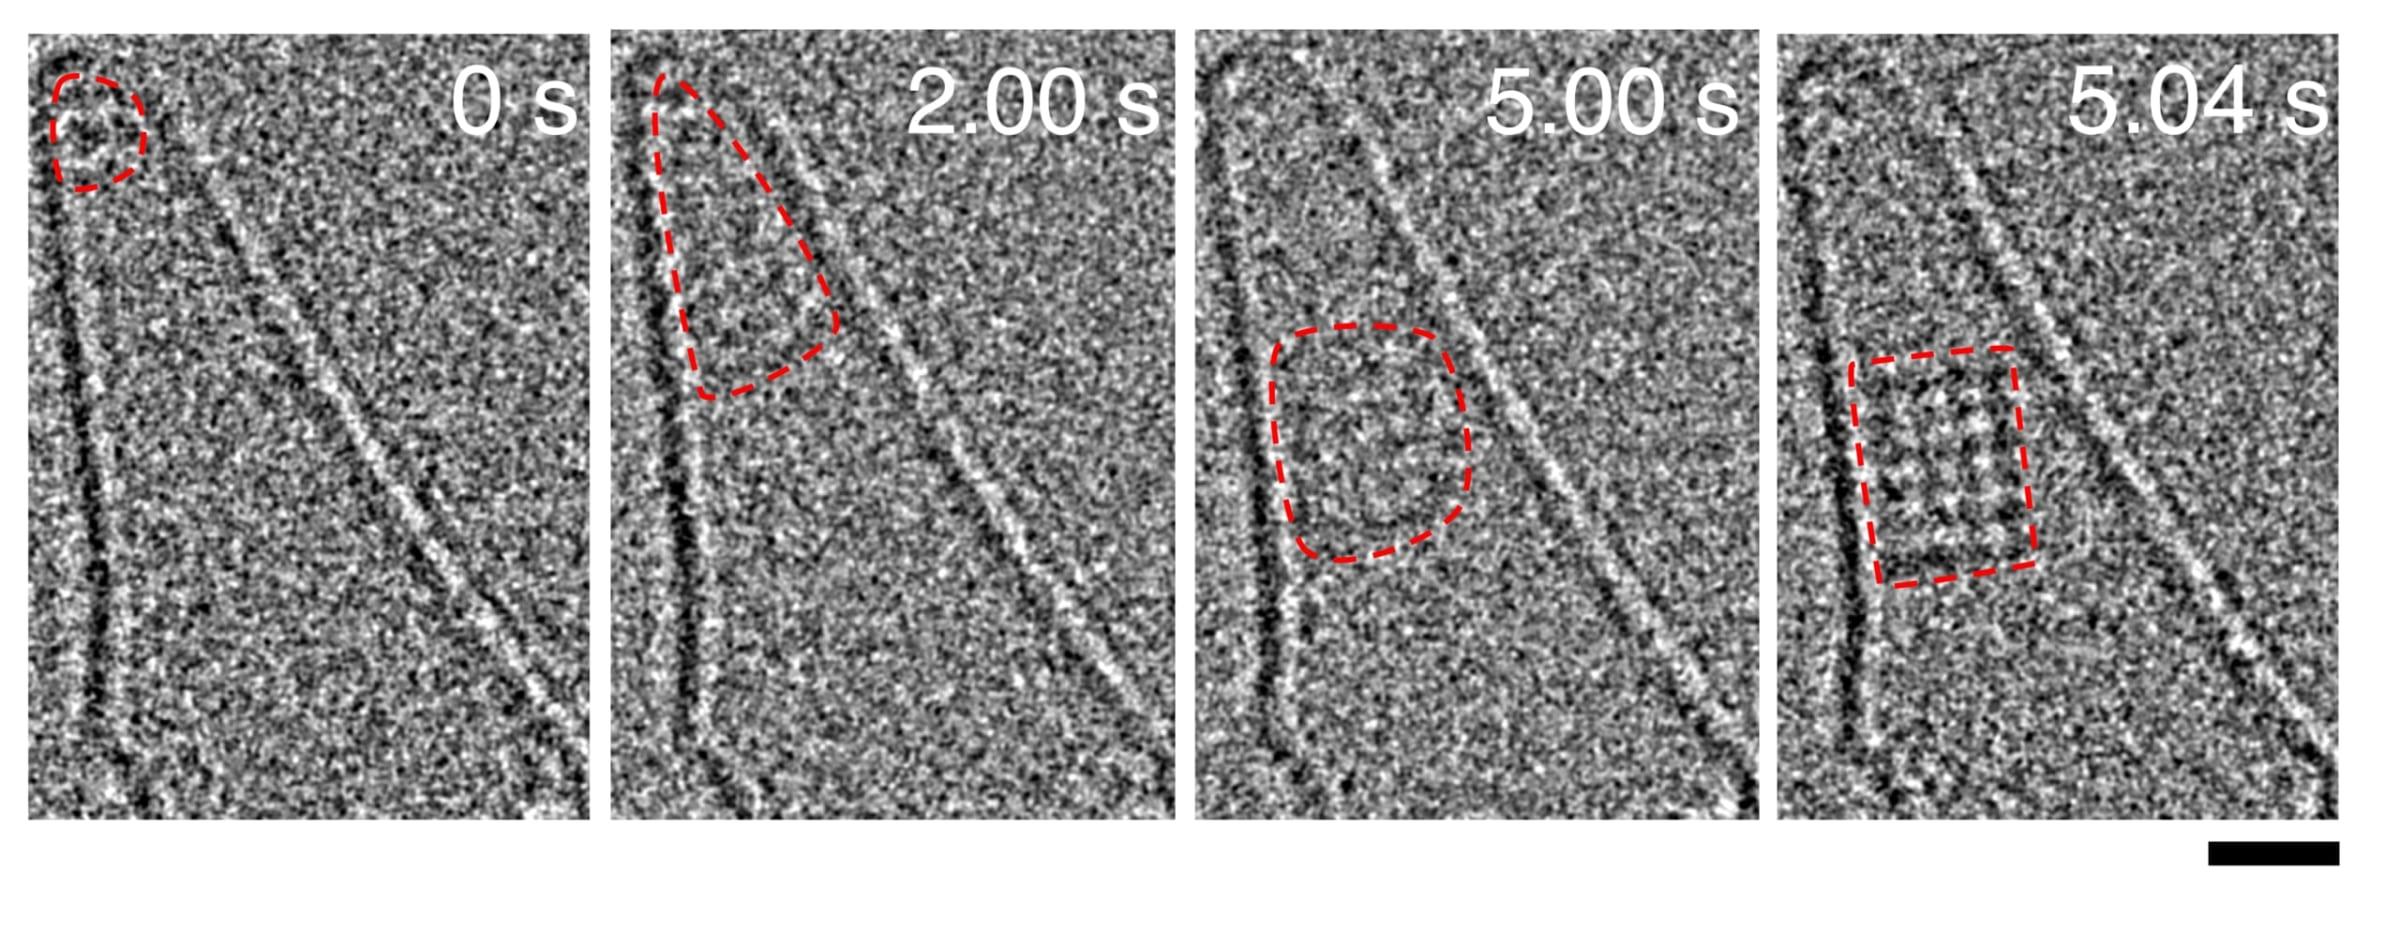 NaCl結晶核が形成される様子を捉えた原子分解能電子顕微鏡動画(40ミリ秒/フレーム)。